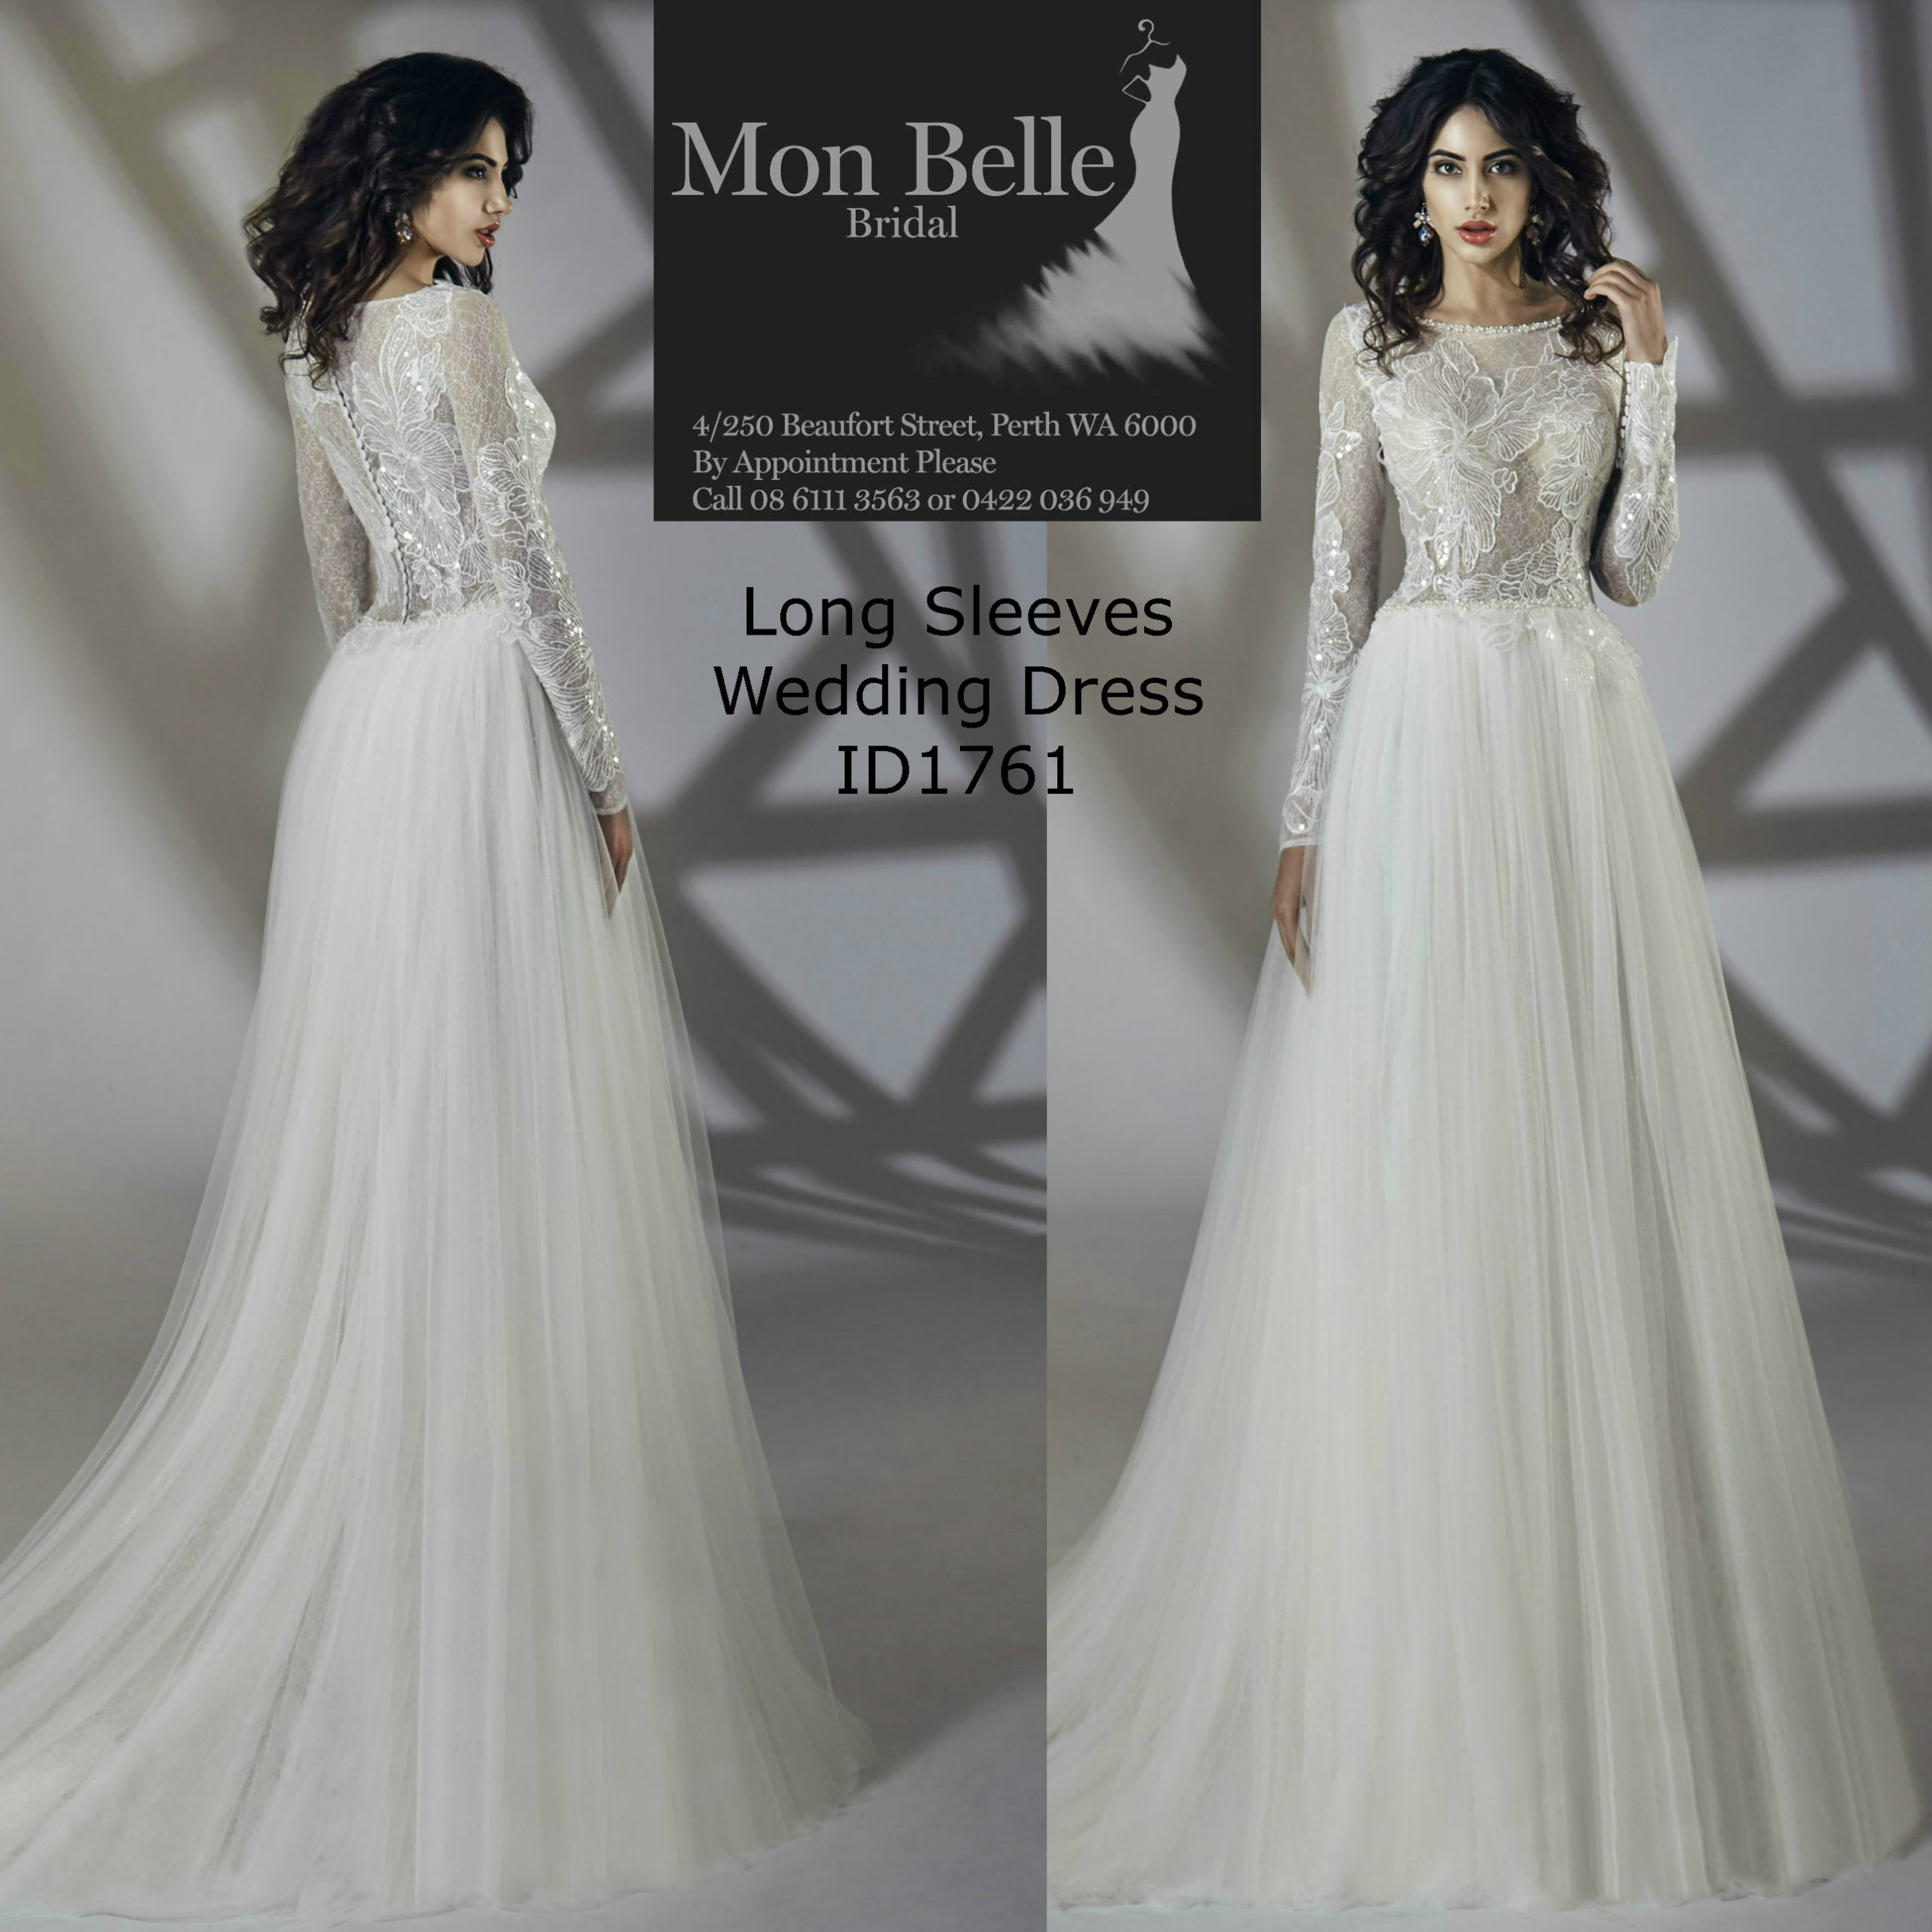 id1761-long-sleeves-wedding-dress-2